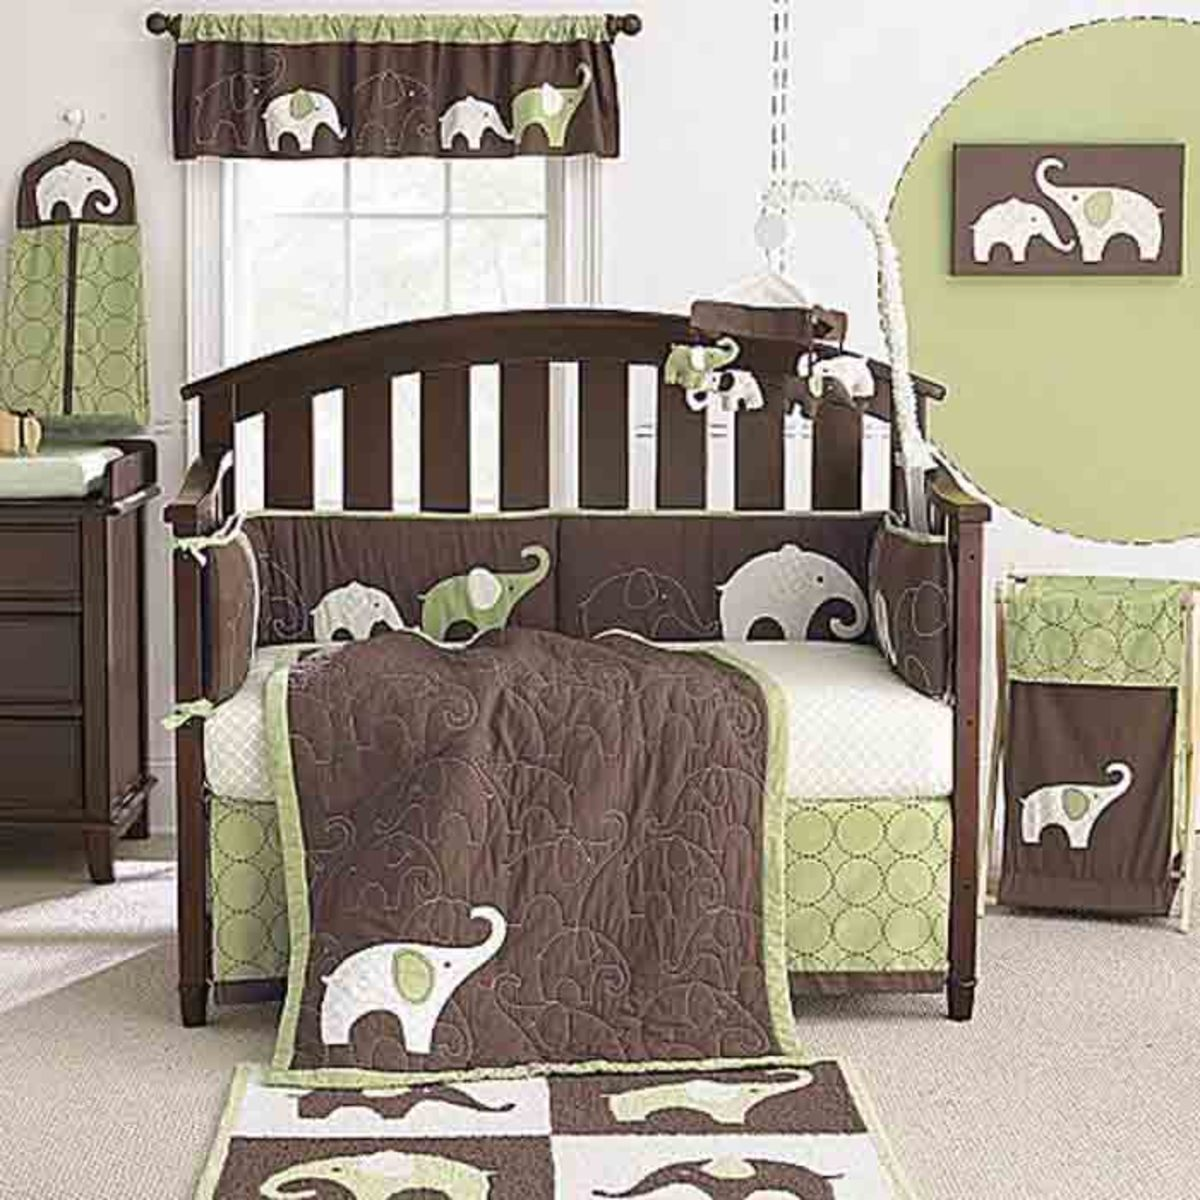 Decorating Ideas For A Baby Boy Nursery